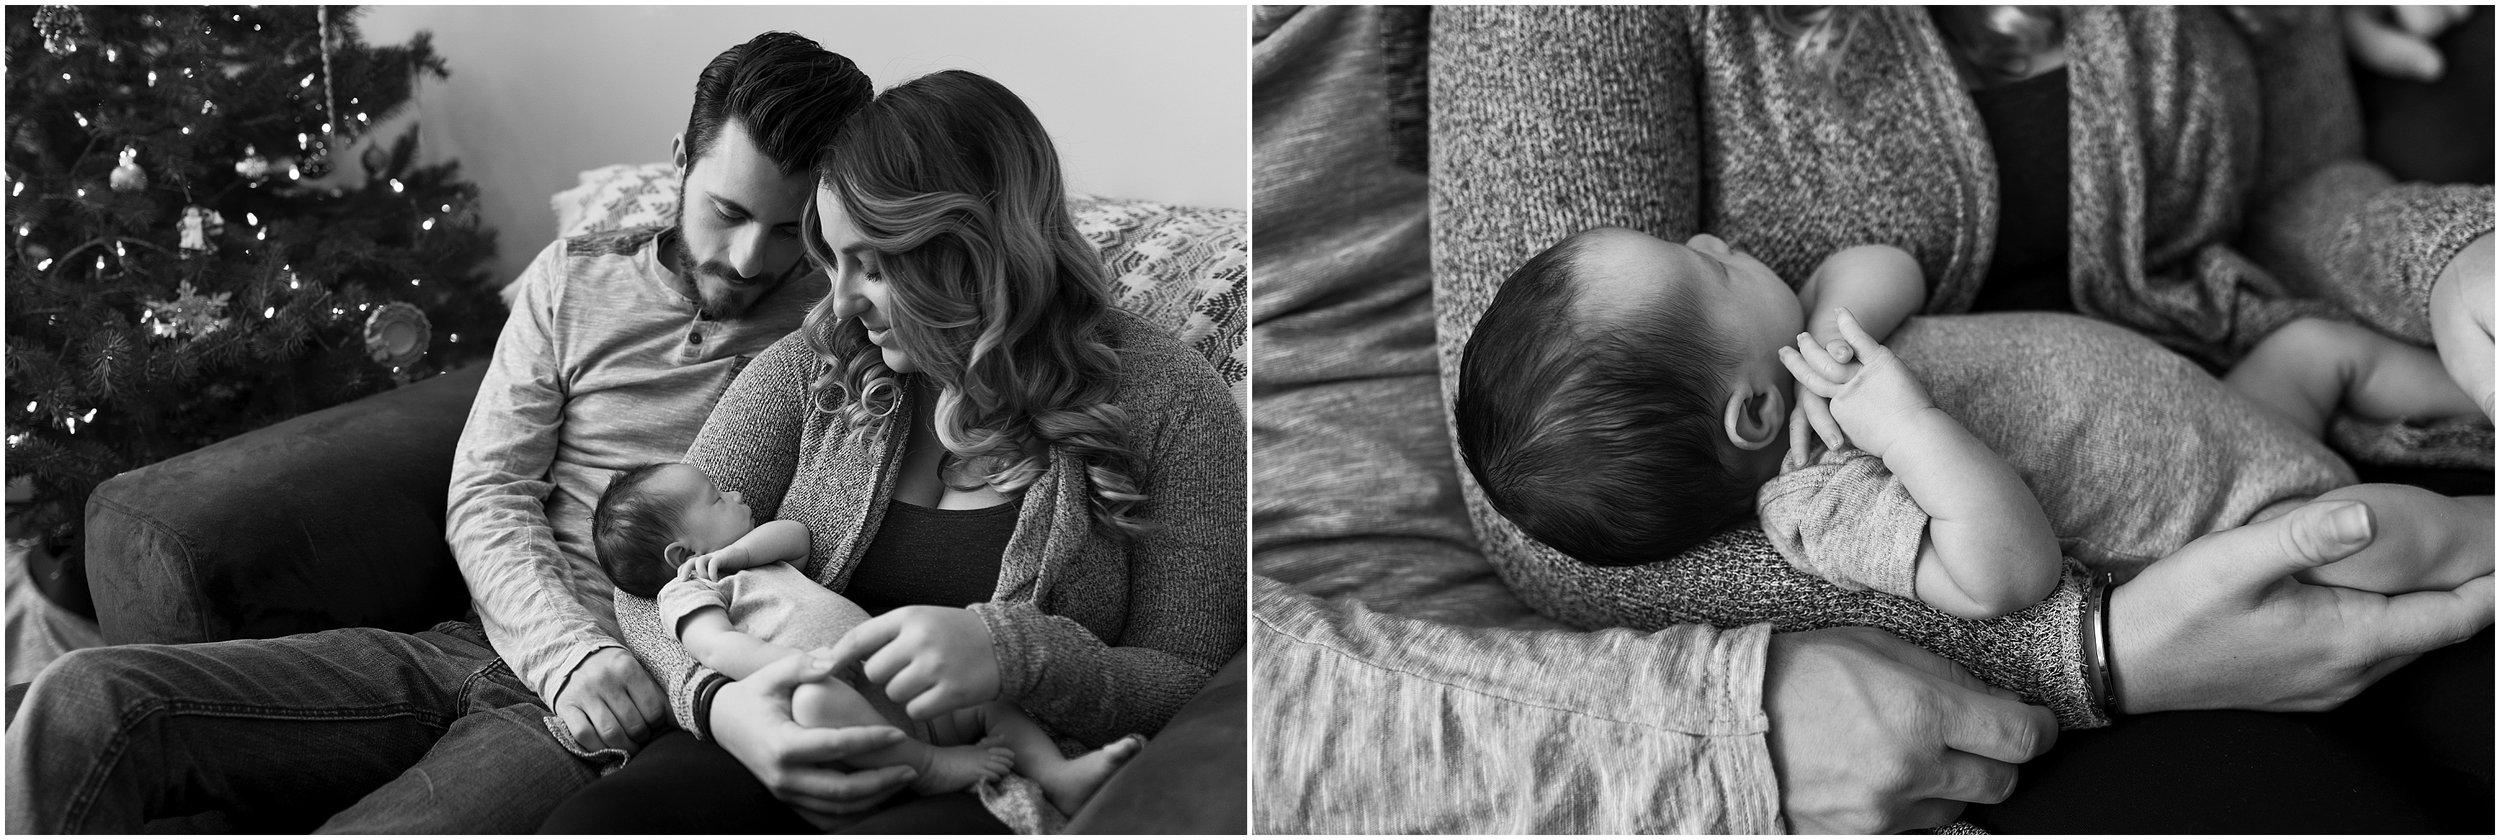 newborn photographer in connecticut. ct newborn photography